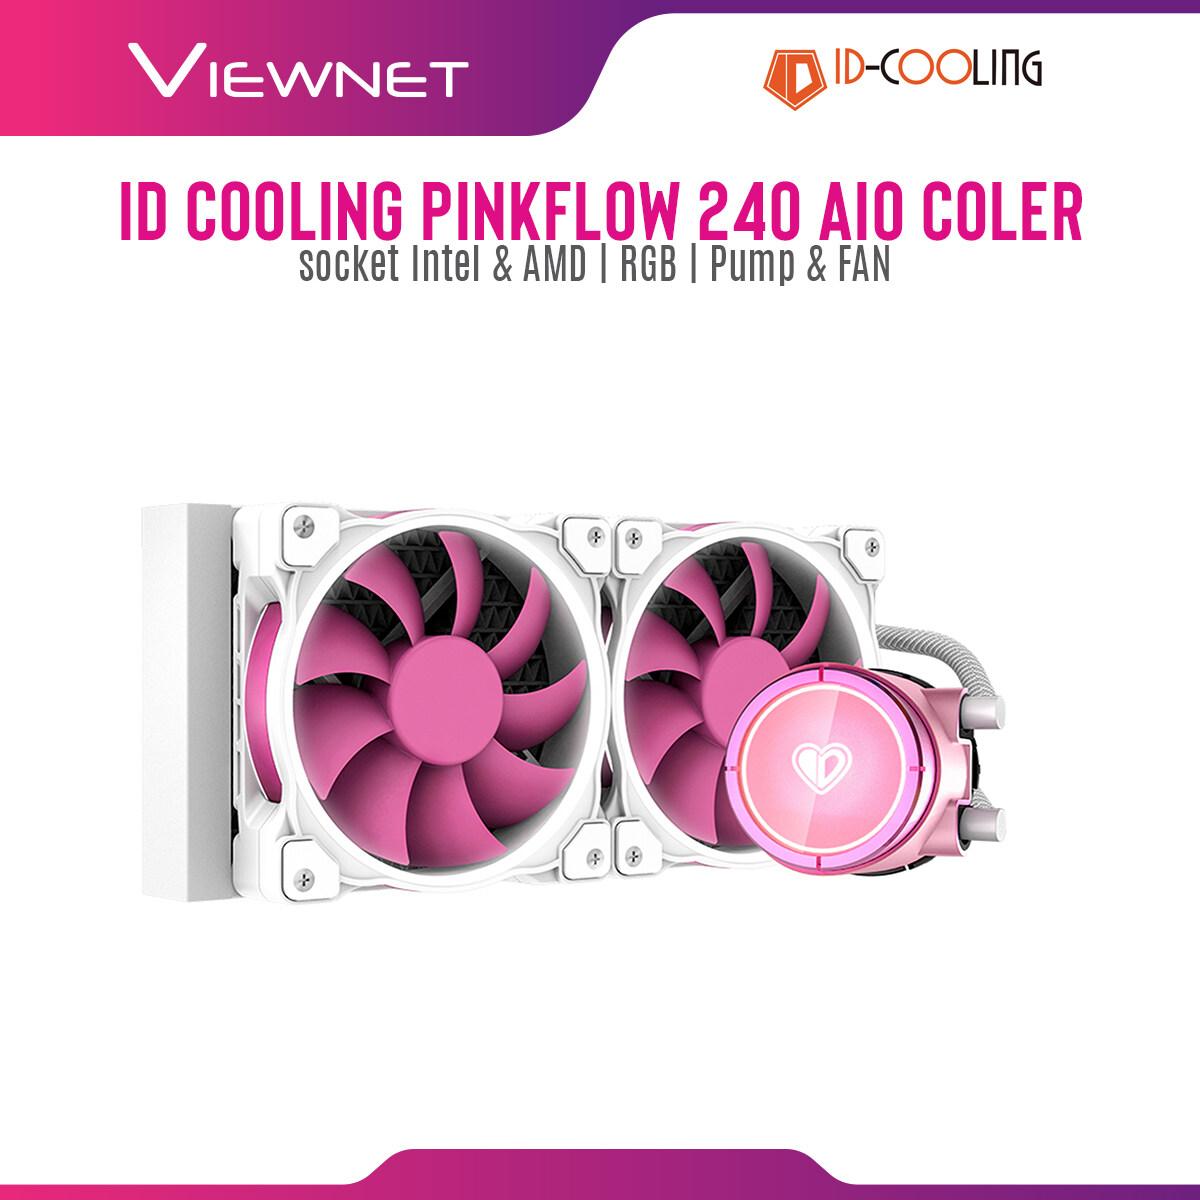 ID-COOLING Pinkflow 240 Water Cooling (DC-PINKFLOW-240)